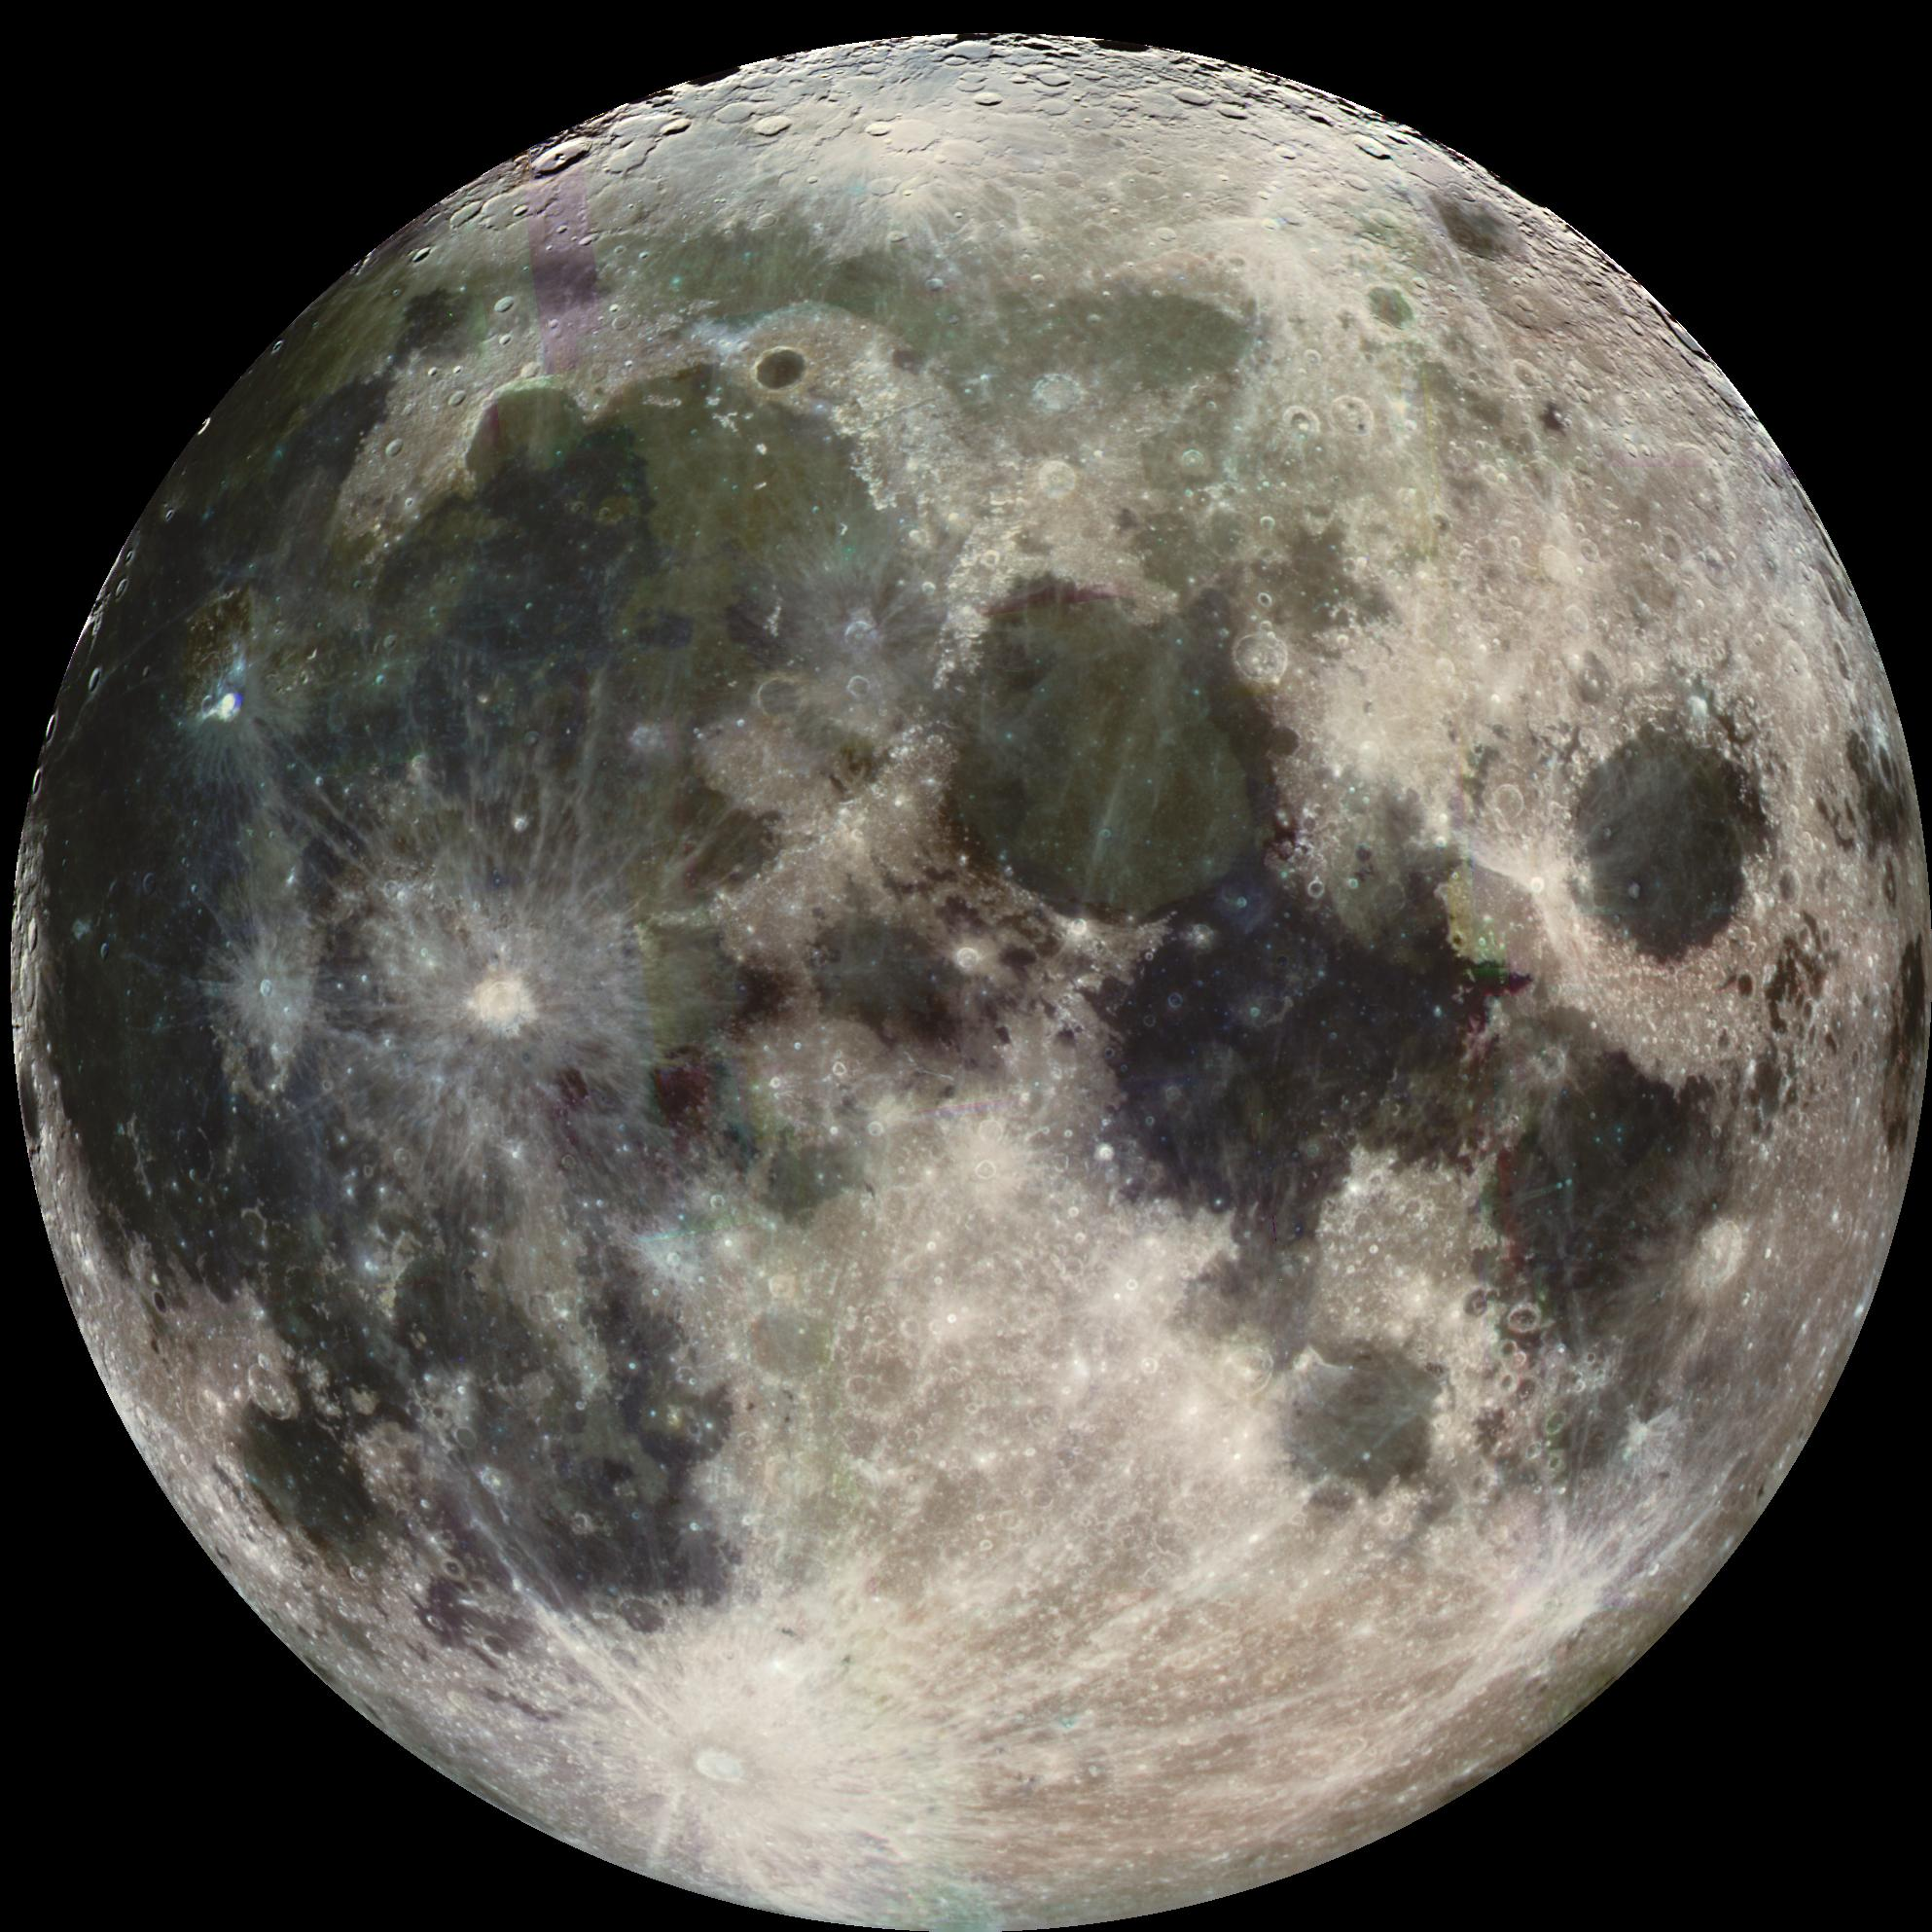 The Full moon (photo: from the galileo mission, 1992, Courtesy of Nasa)